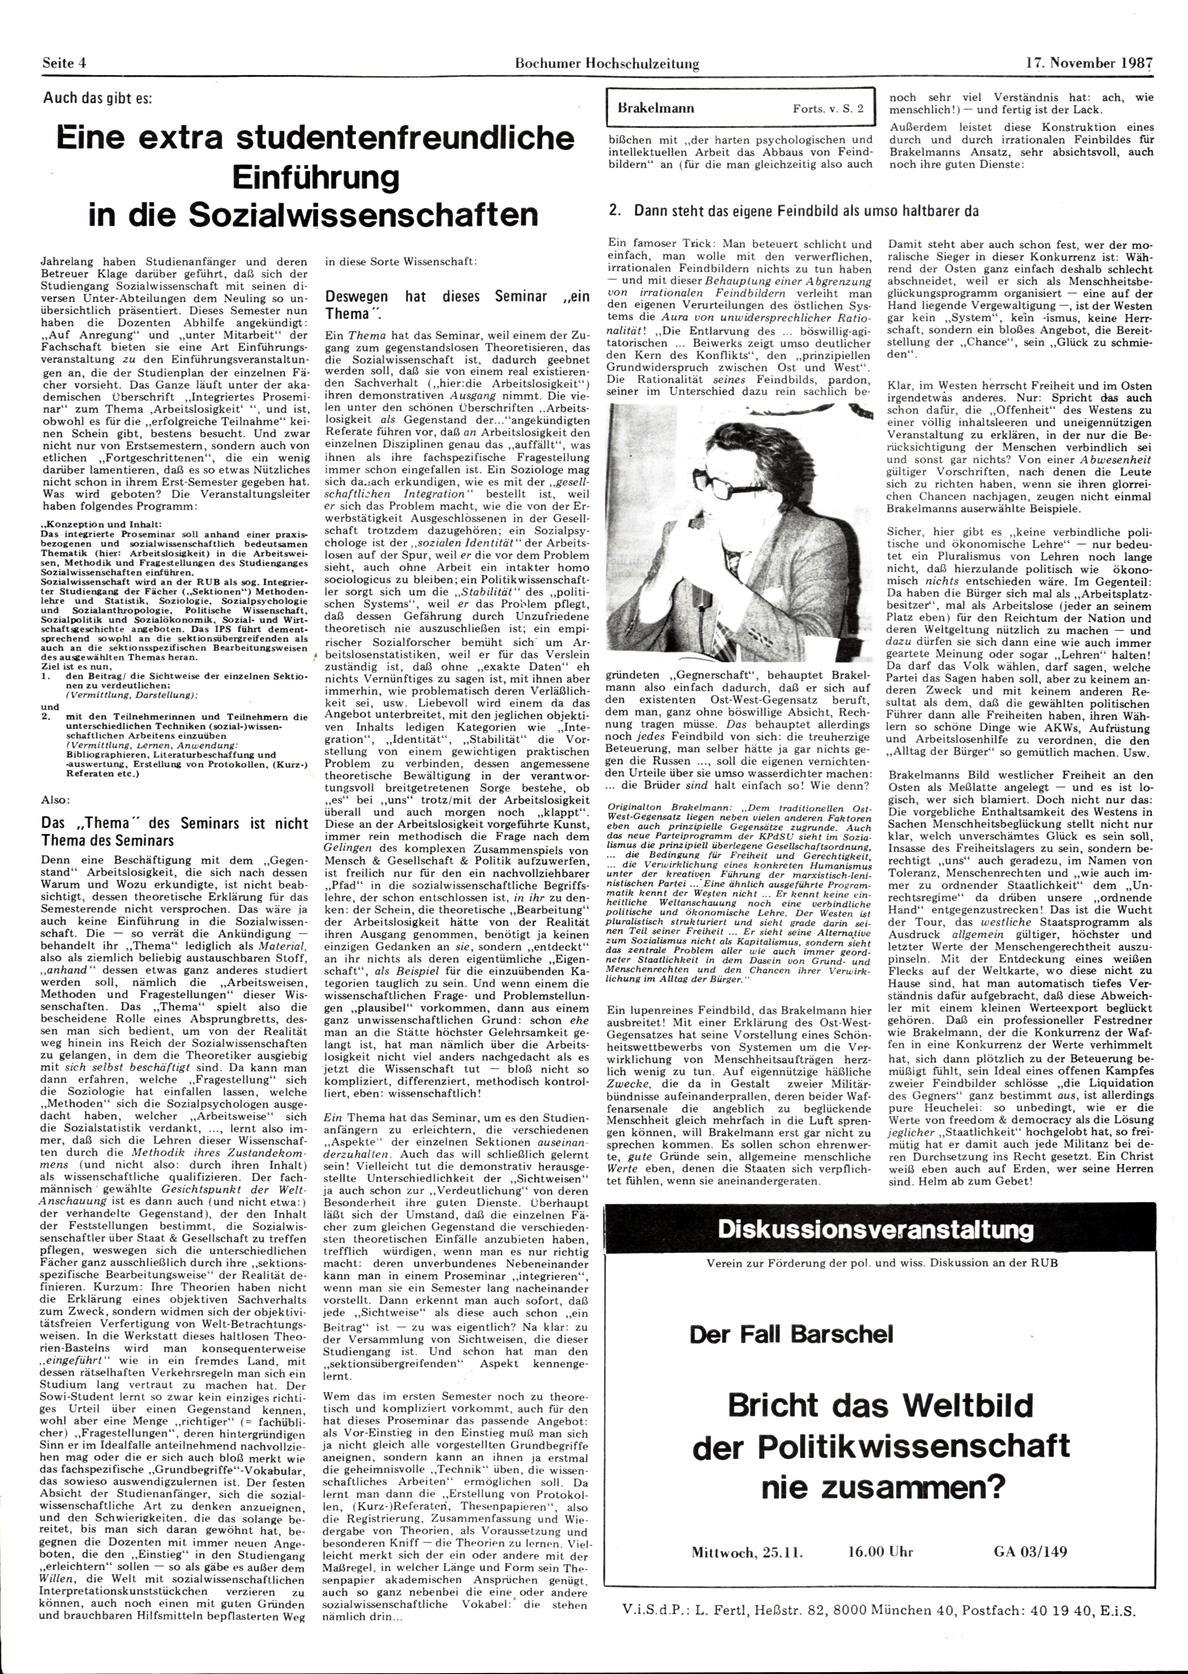 Bochum_BHZ_19871117_159_004